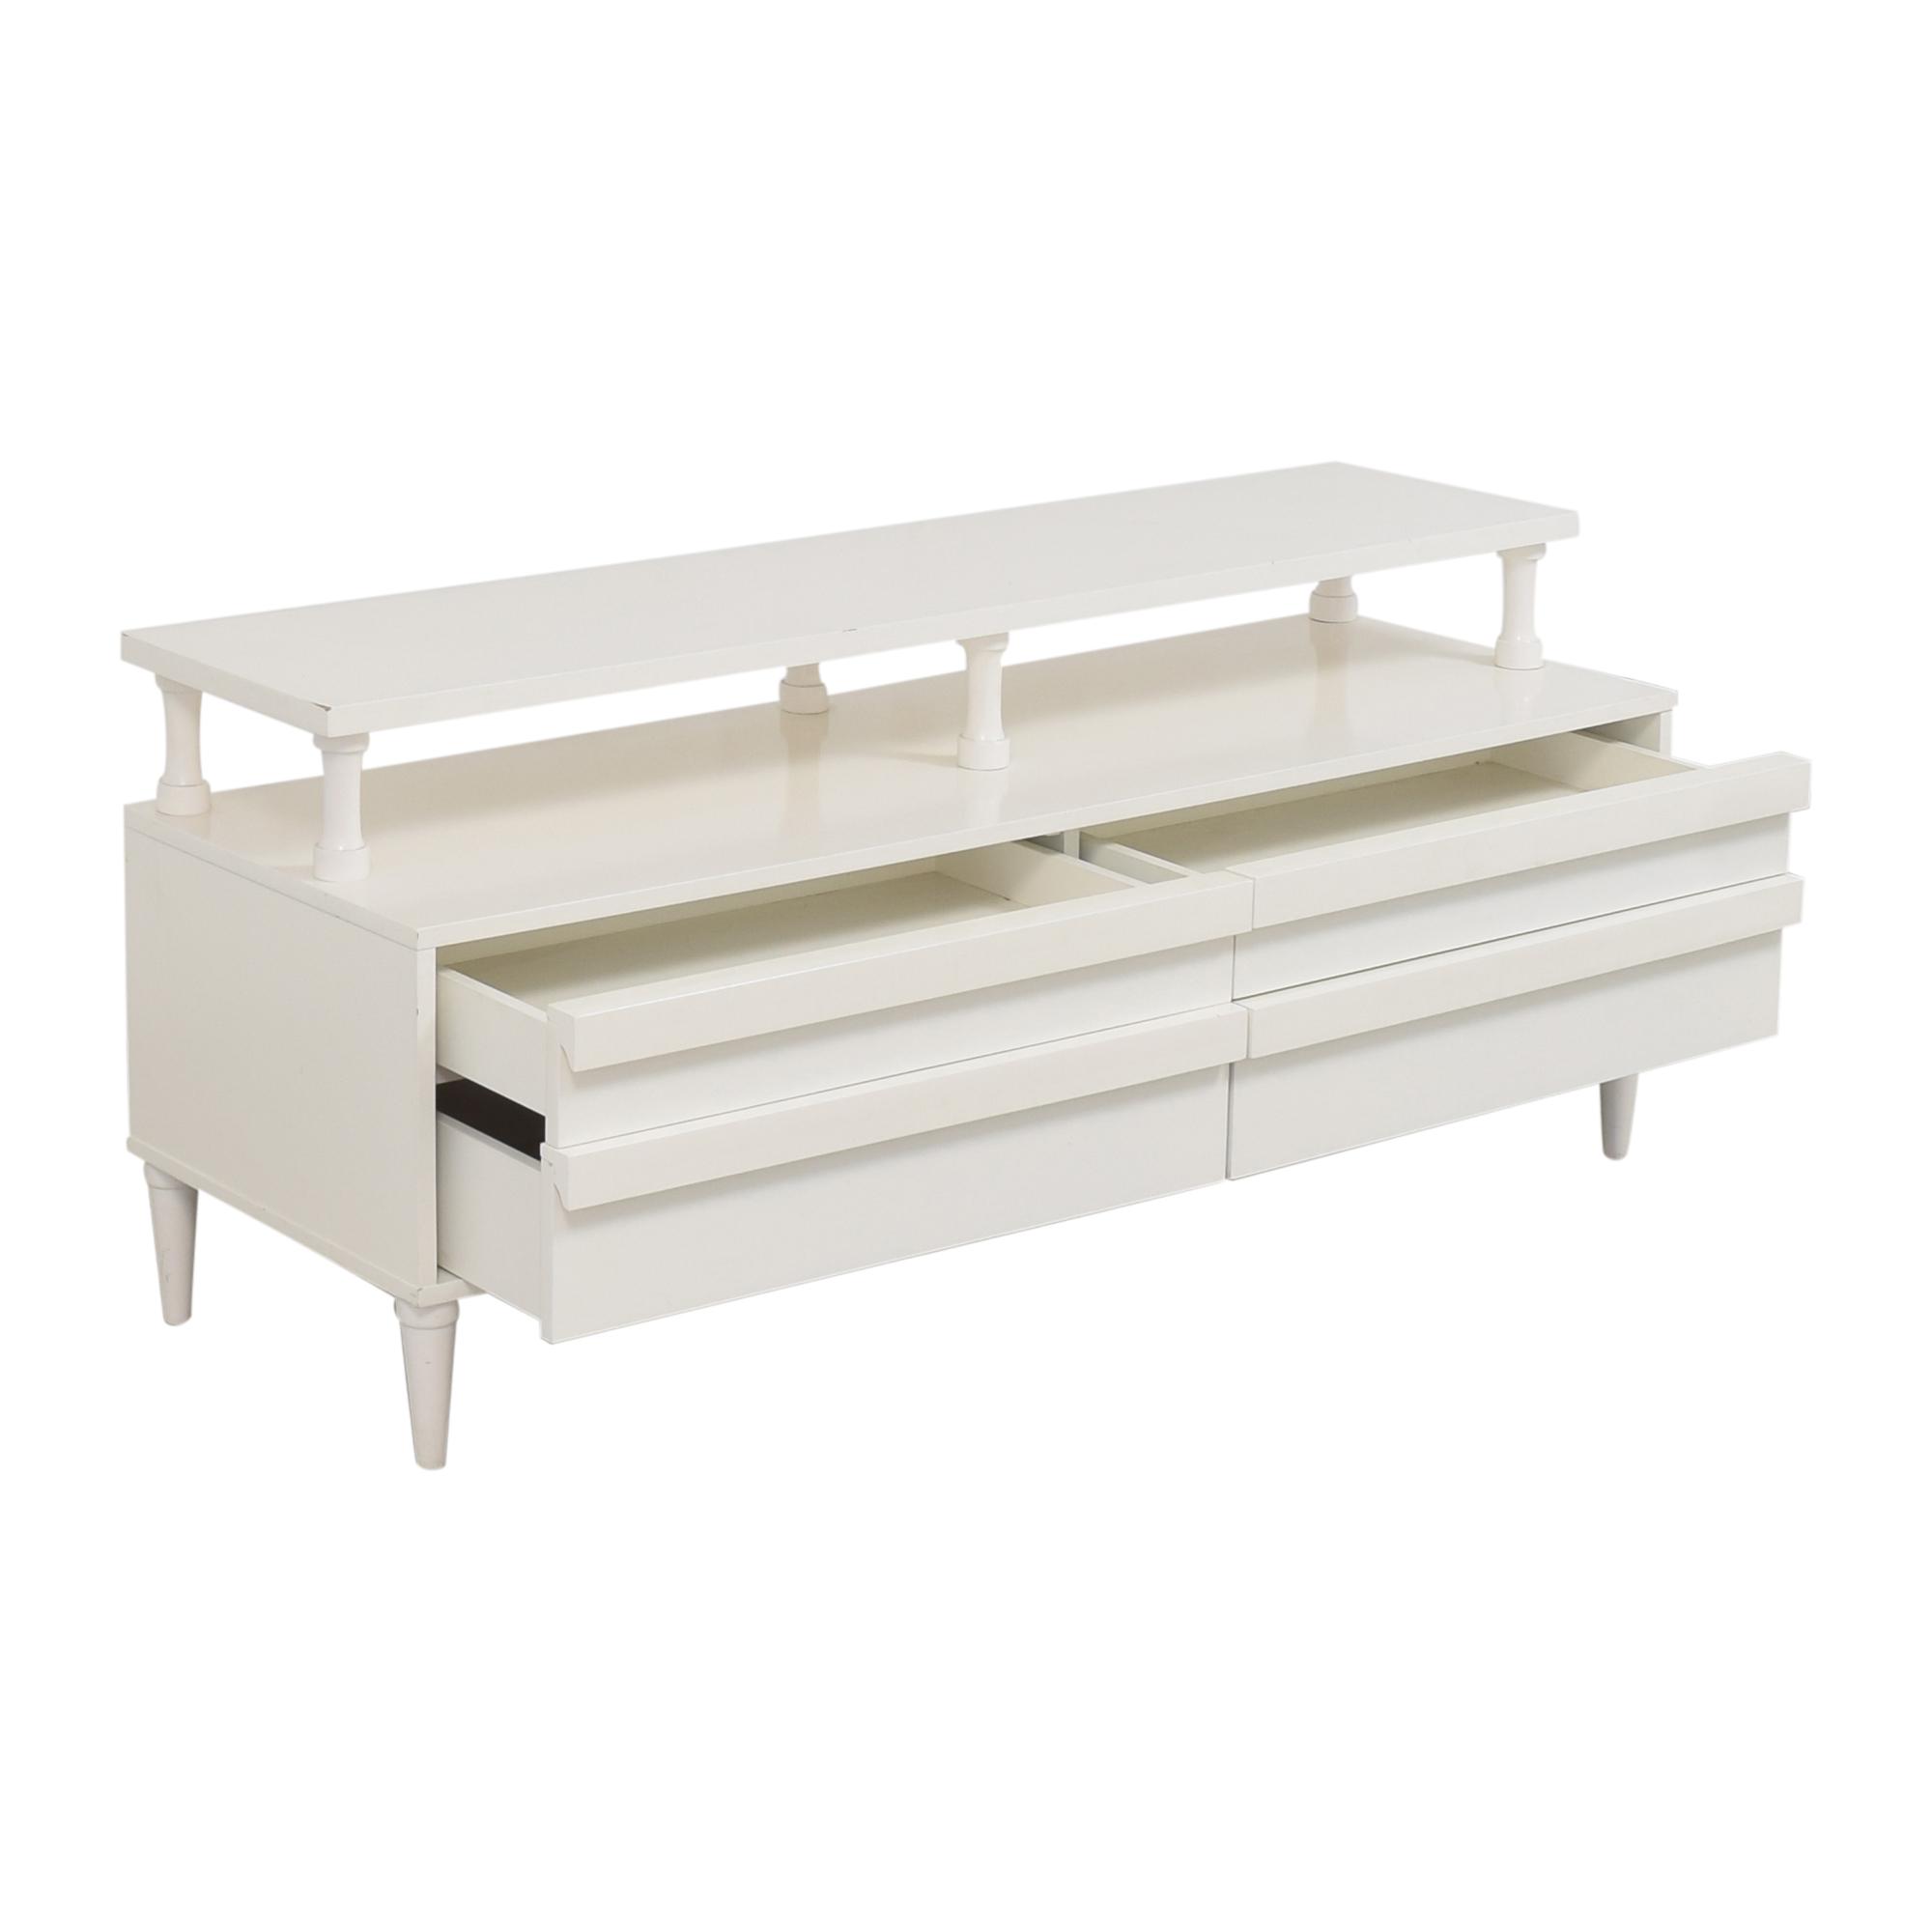 West Elm Paul Loebach Credenza / Cabinets & Sideboards